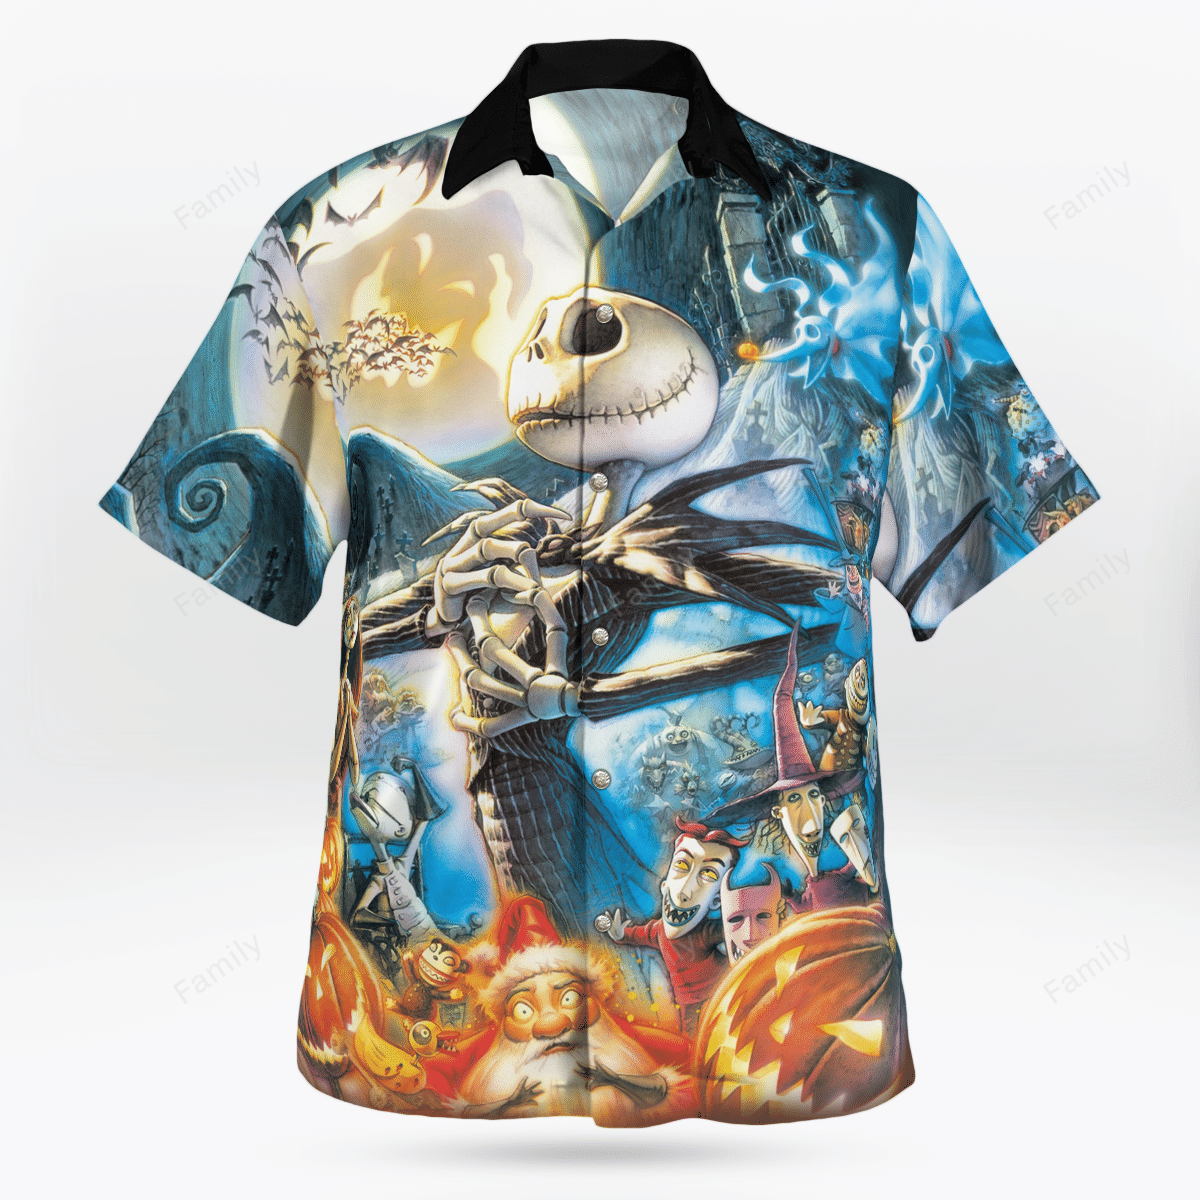 The NightMare artists Jack Skellington Halloween Hawaiian shirt